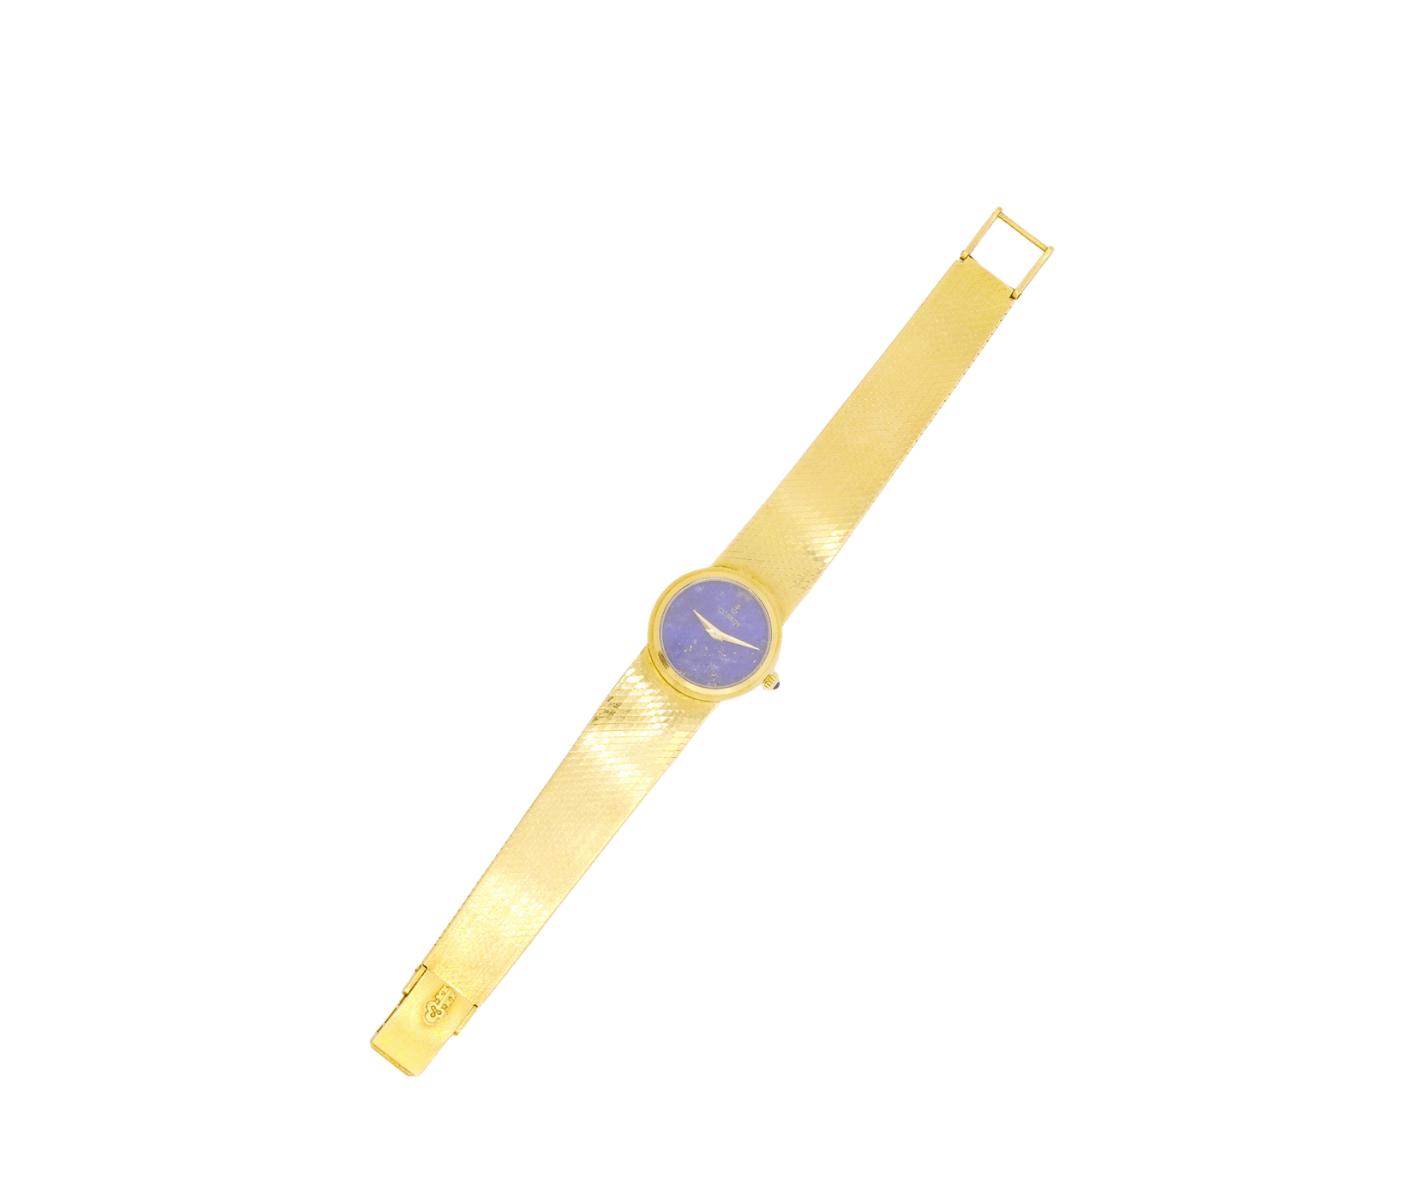 Rare Women's Vintage Corum 158213 23mm 18kt Yellow Gold Swiss Blue Lapis Dial Swiss Manual Wind Wrist Watch